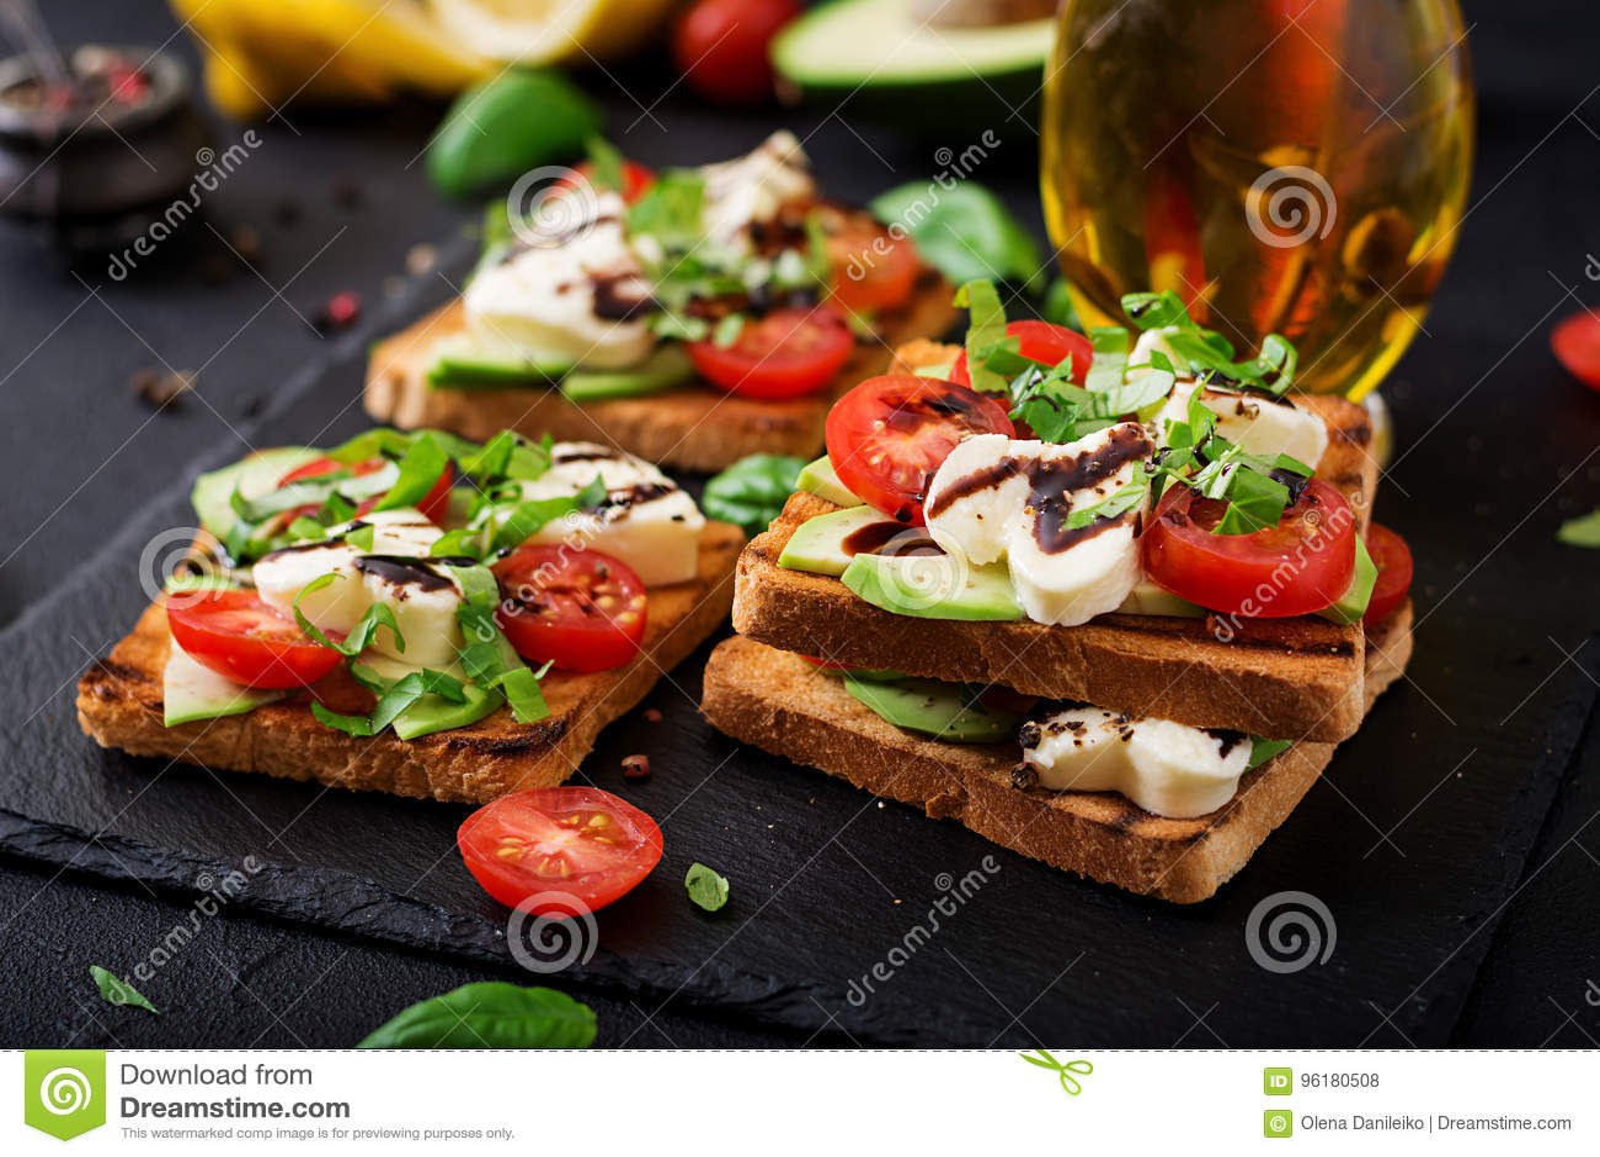 https://thumbs.dreamstime.com/z/sandwich-toasts-tomatoes-mozzarella-avocado-basil-balsamic-vinegar-96180508.jpg